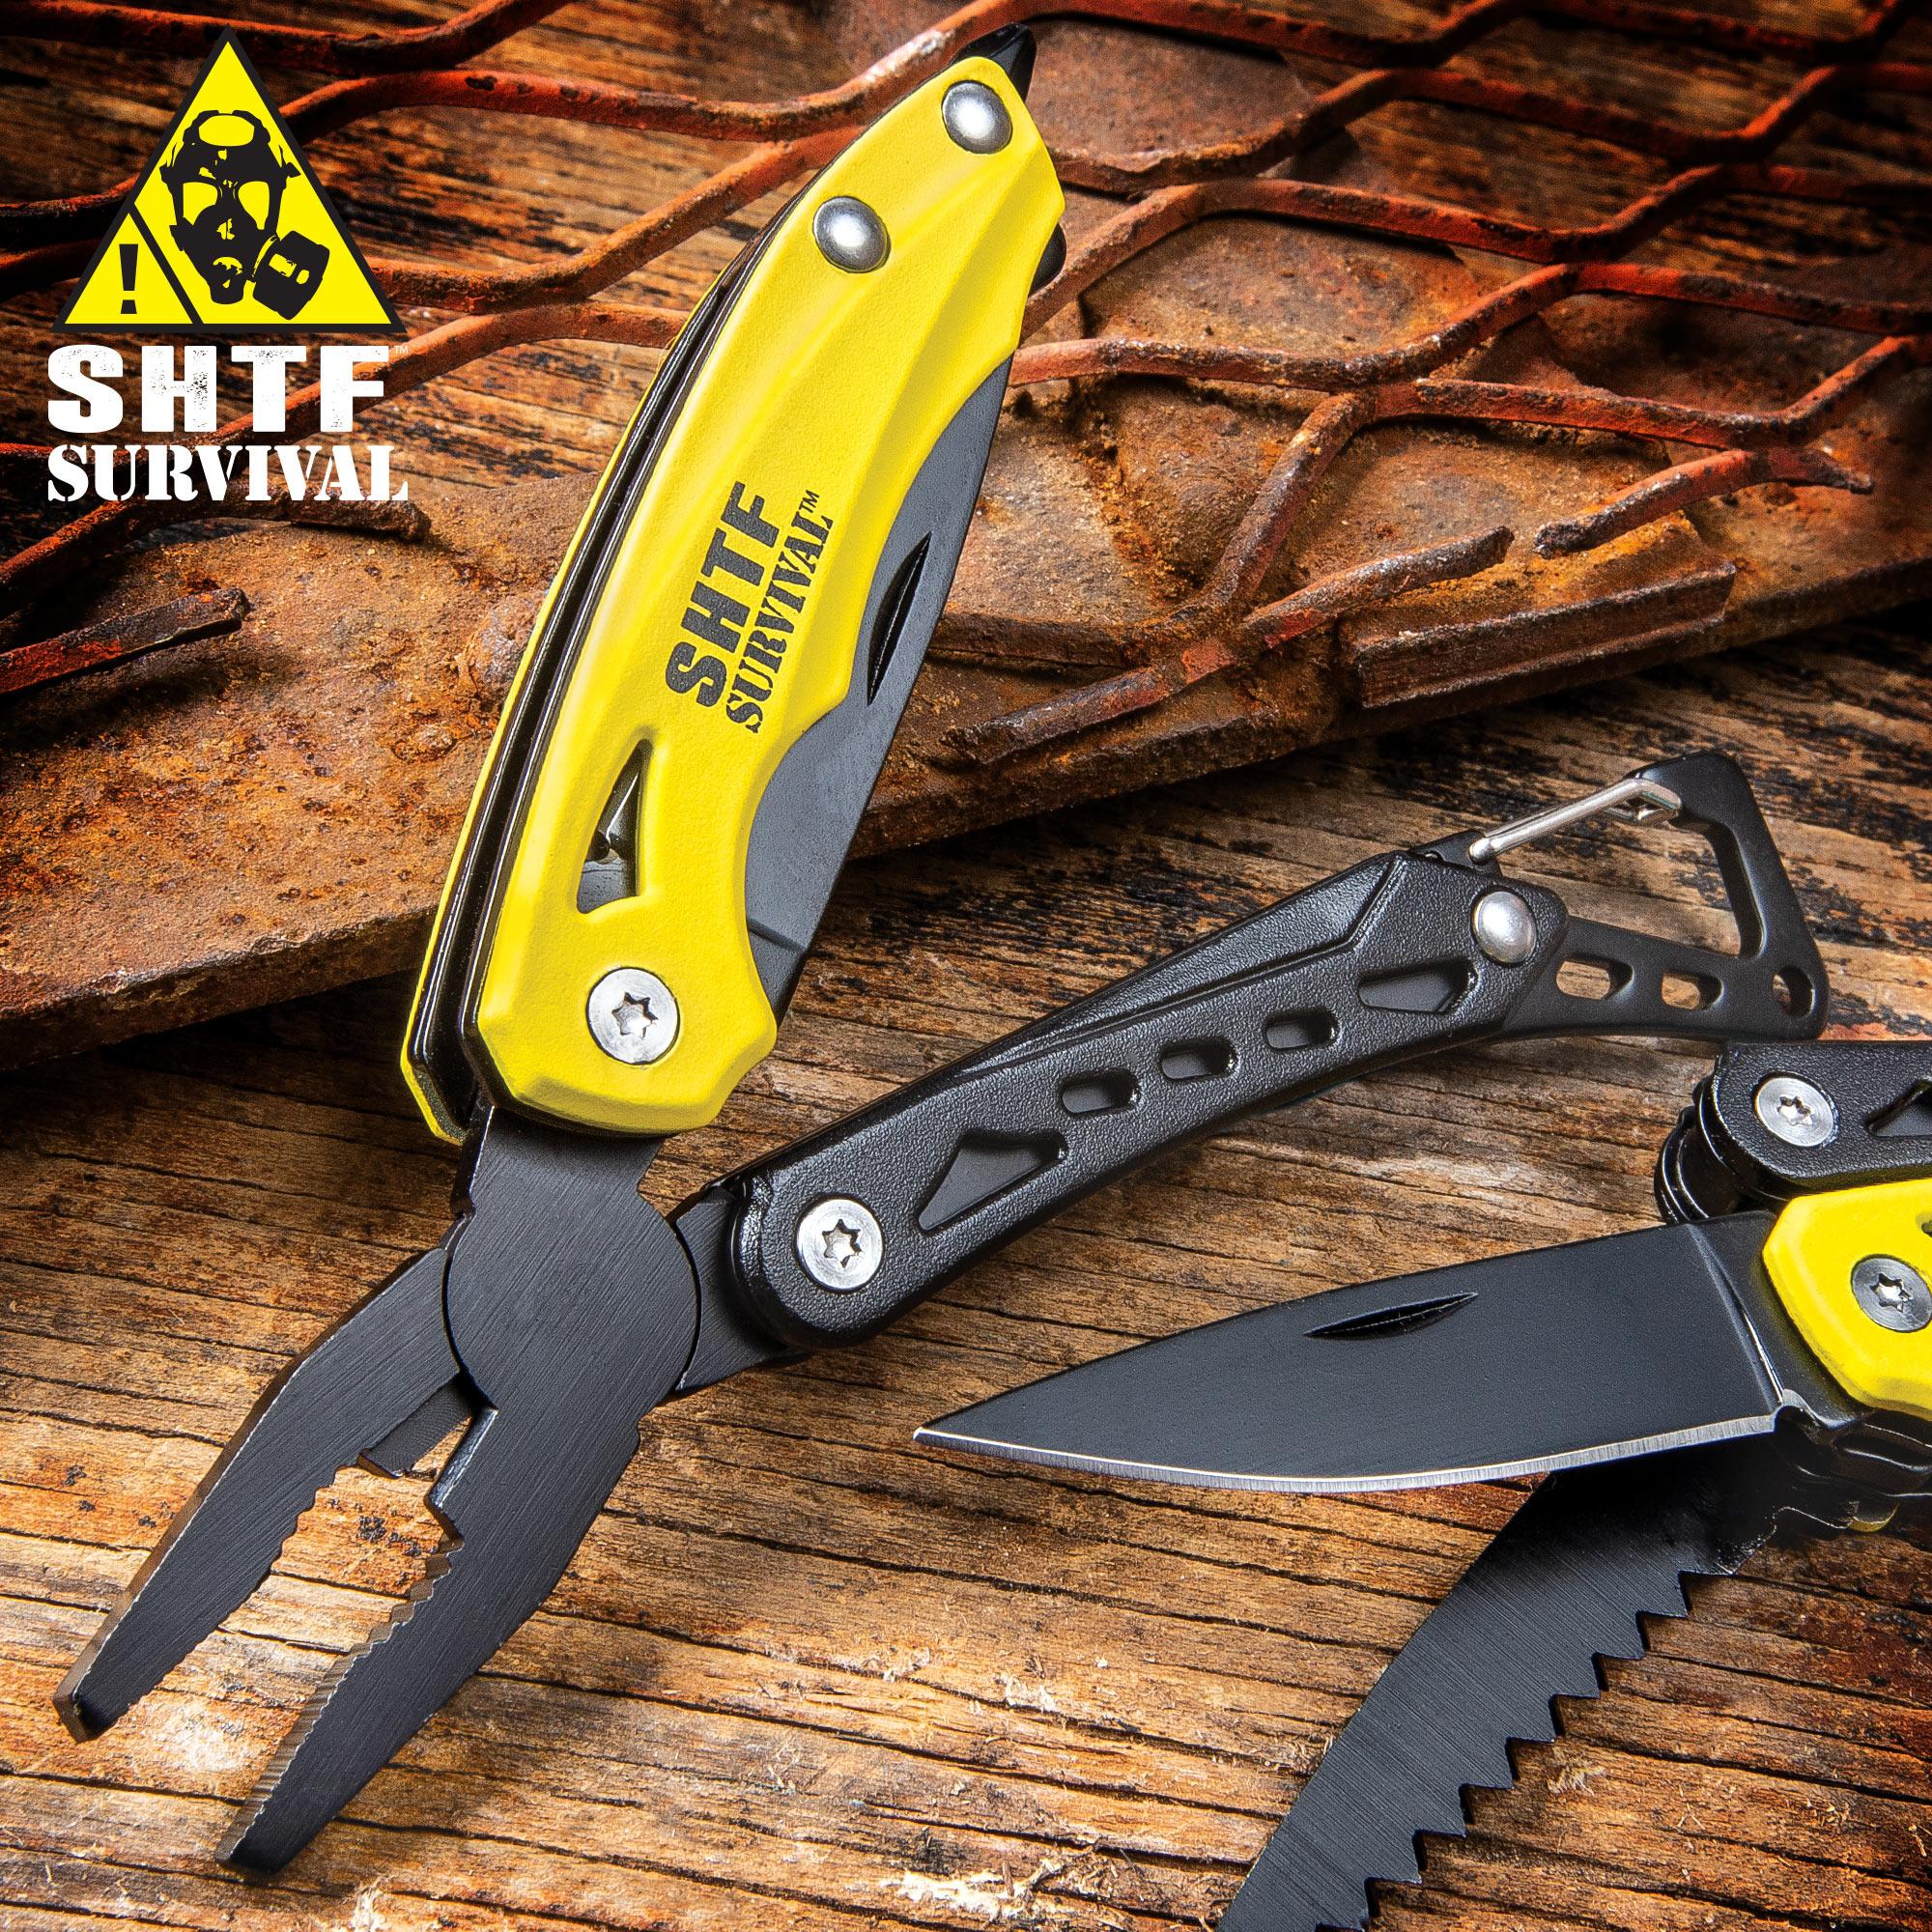 Survival Plier Fold Pocket Screwdriver Multi Tool Hiking Outdoor Camping Knives